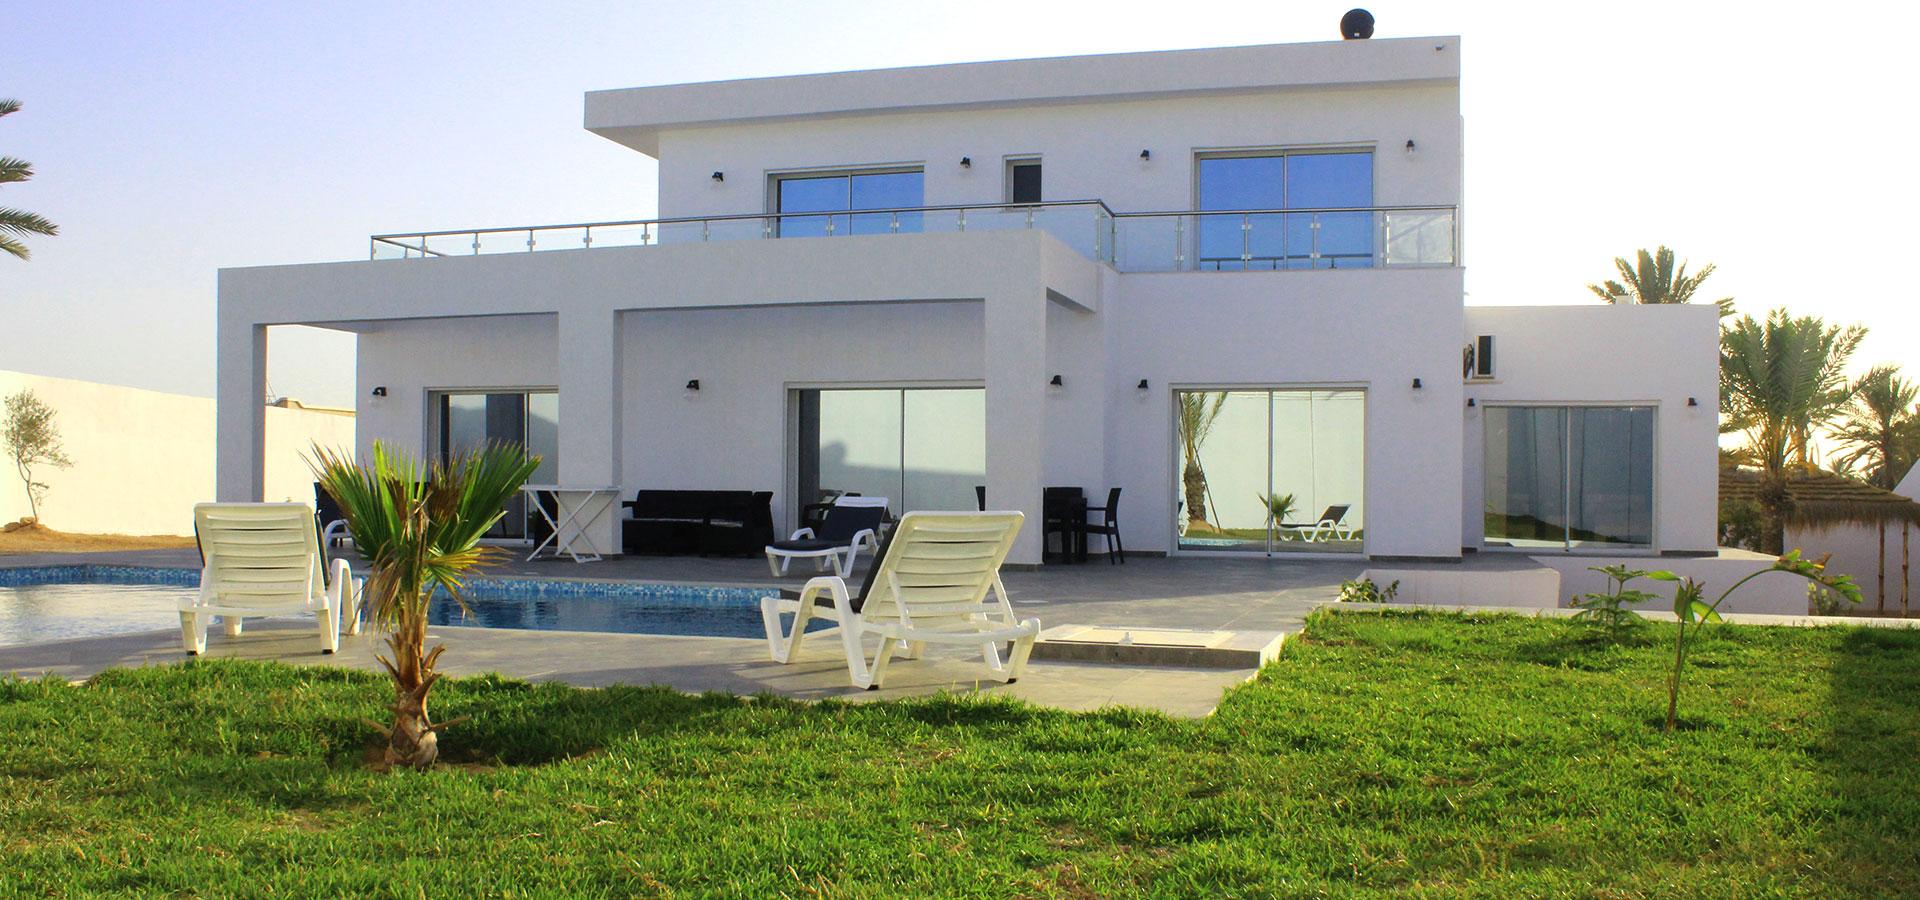 séjour à Djerba Tunisie -